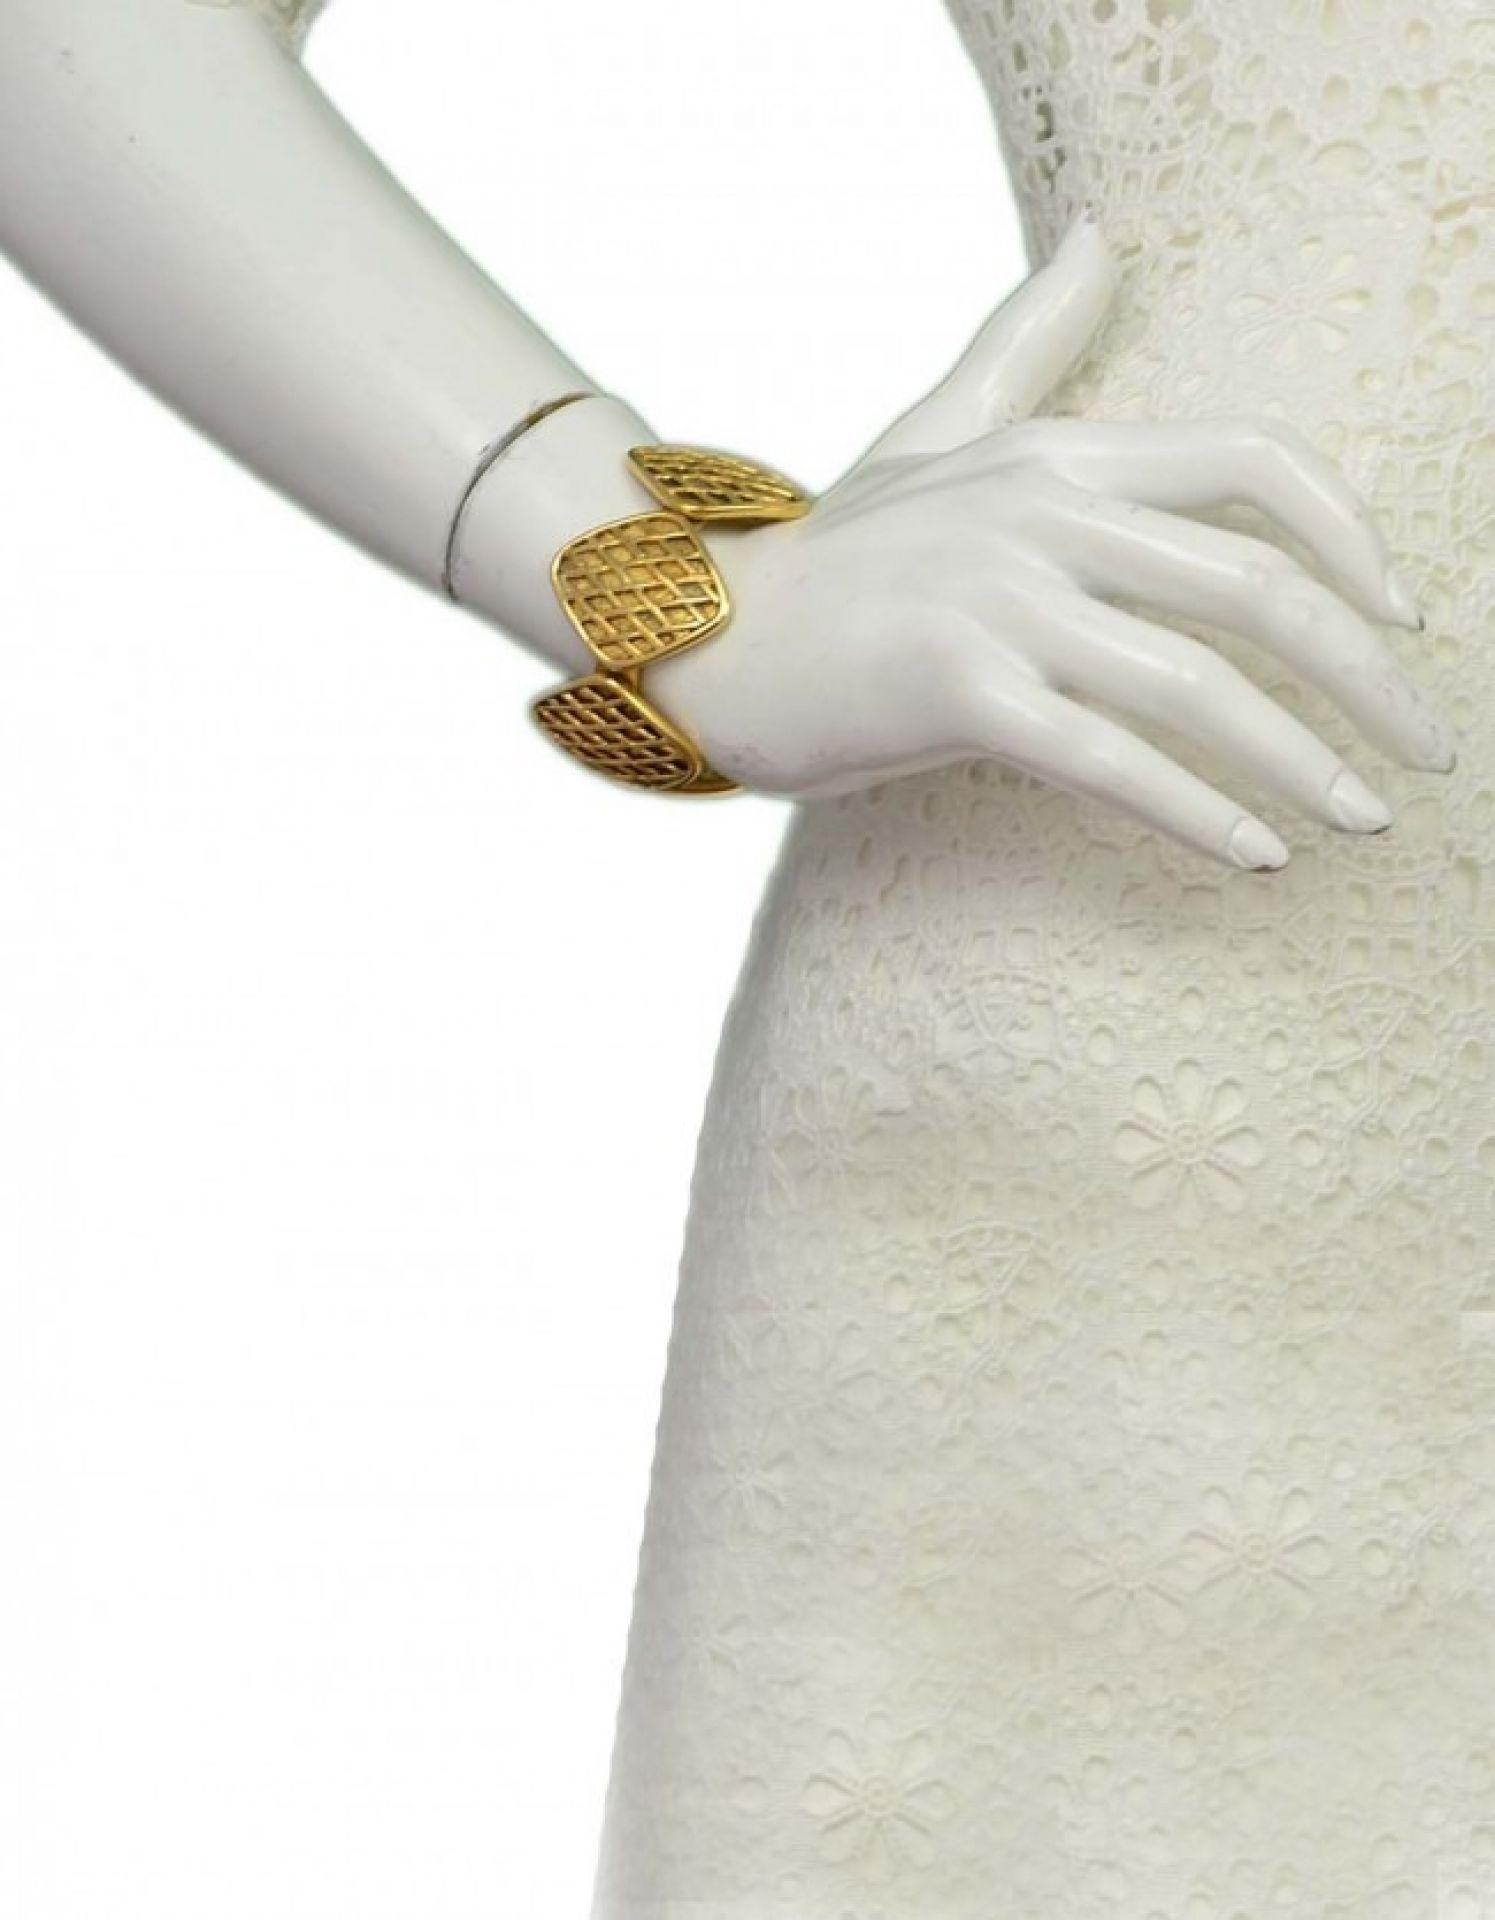 CHANEL Vintage '90s Gold Diamond Cuff Bracelet